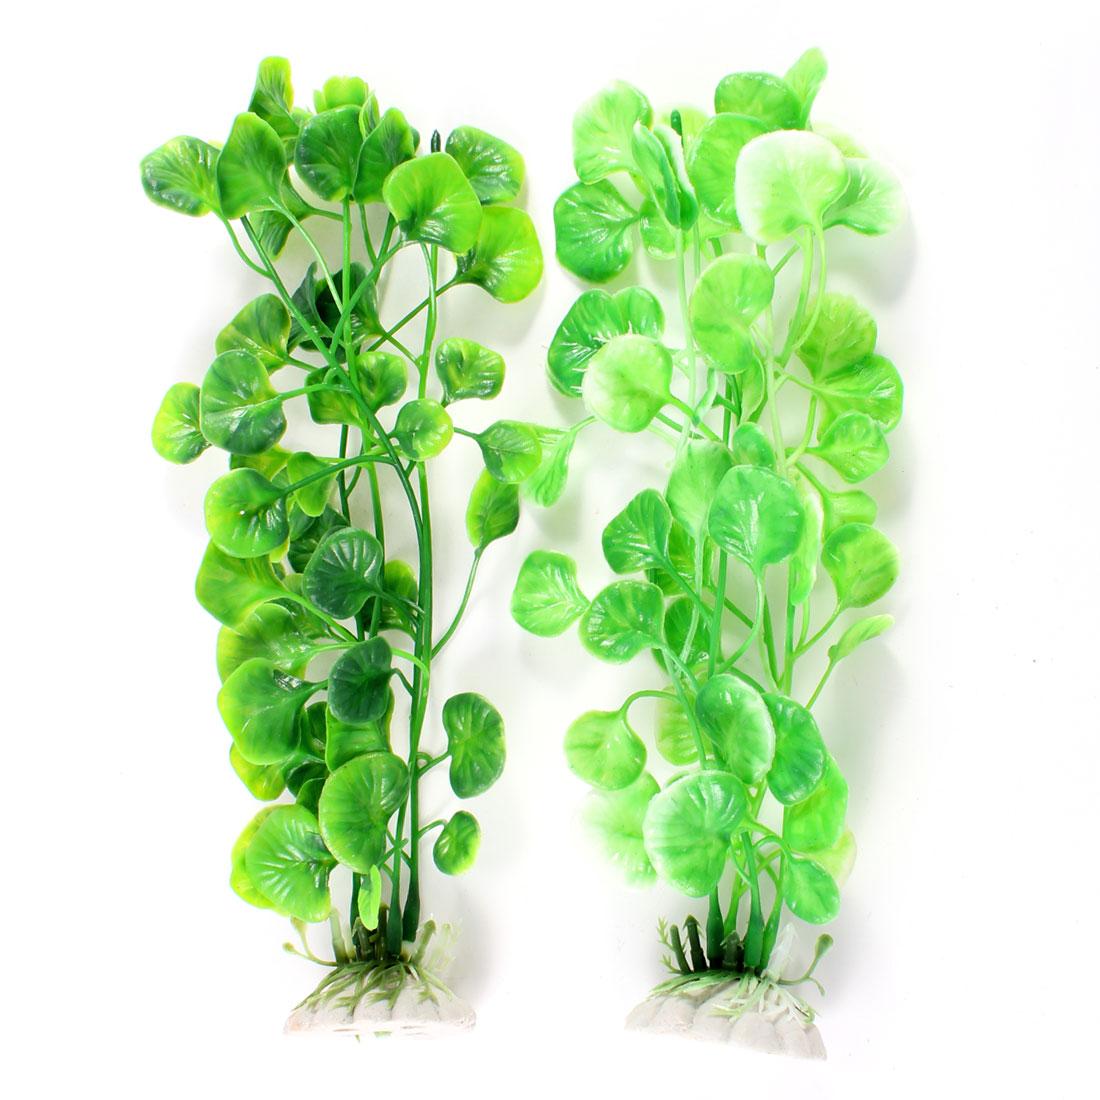 "2 Pcs Green Plastic Water Grass Decoration 8.7"" High for Aquarium"